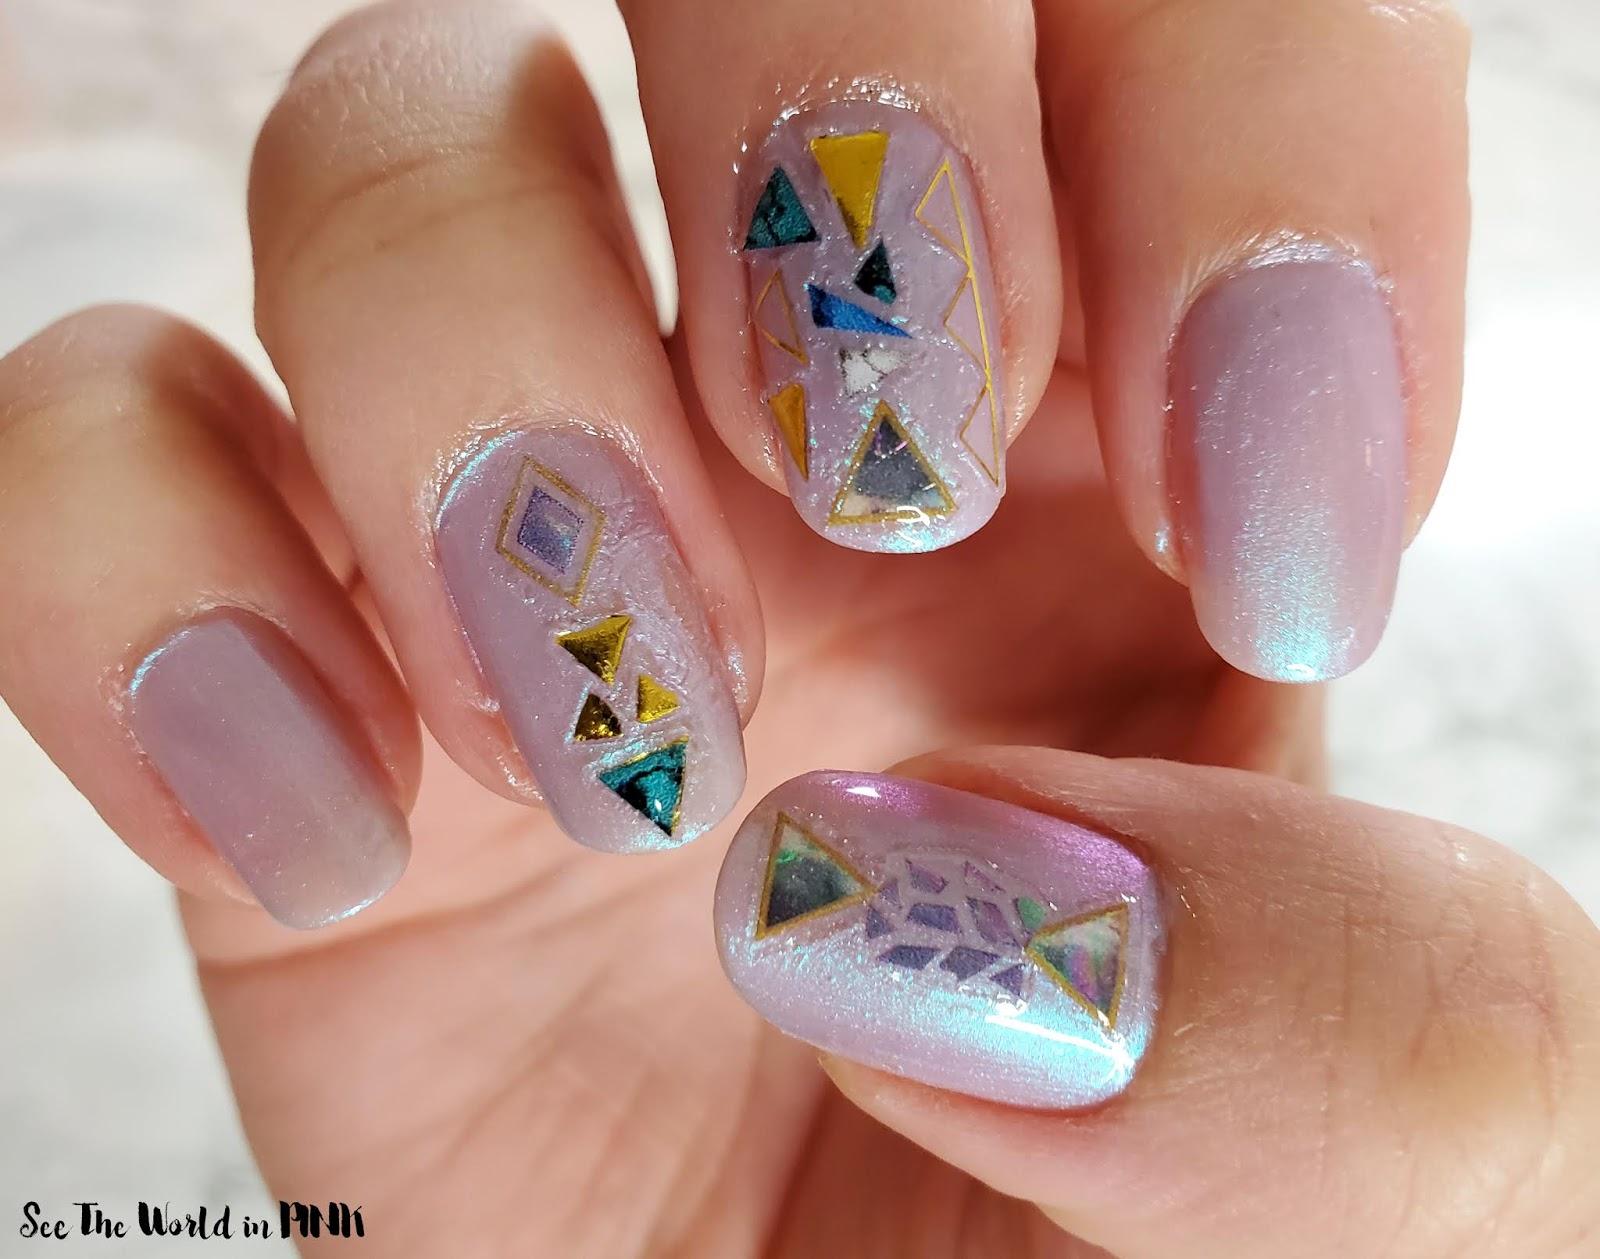 Manicure Monday - Shimmery Gem Stone Nail Stickers